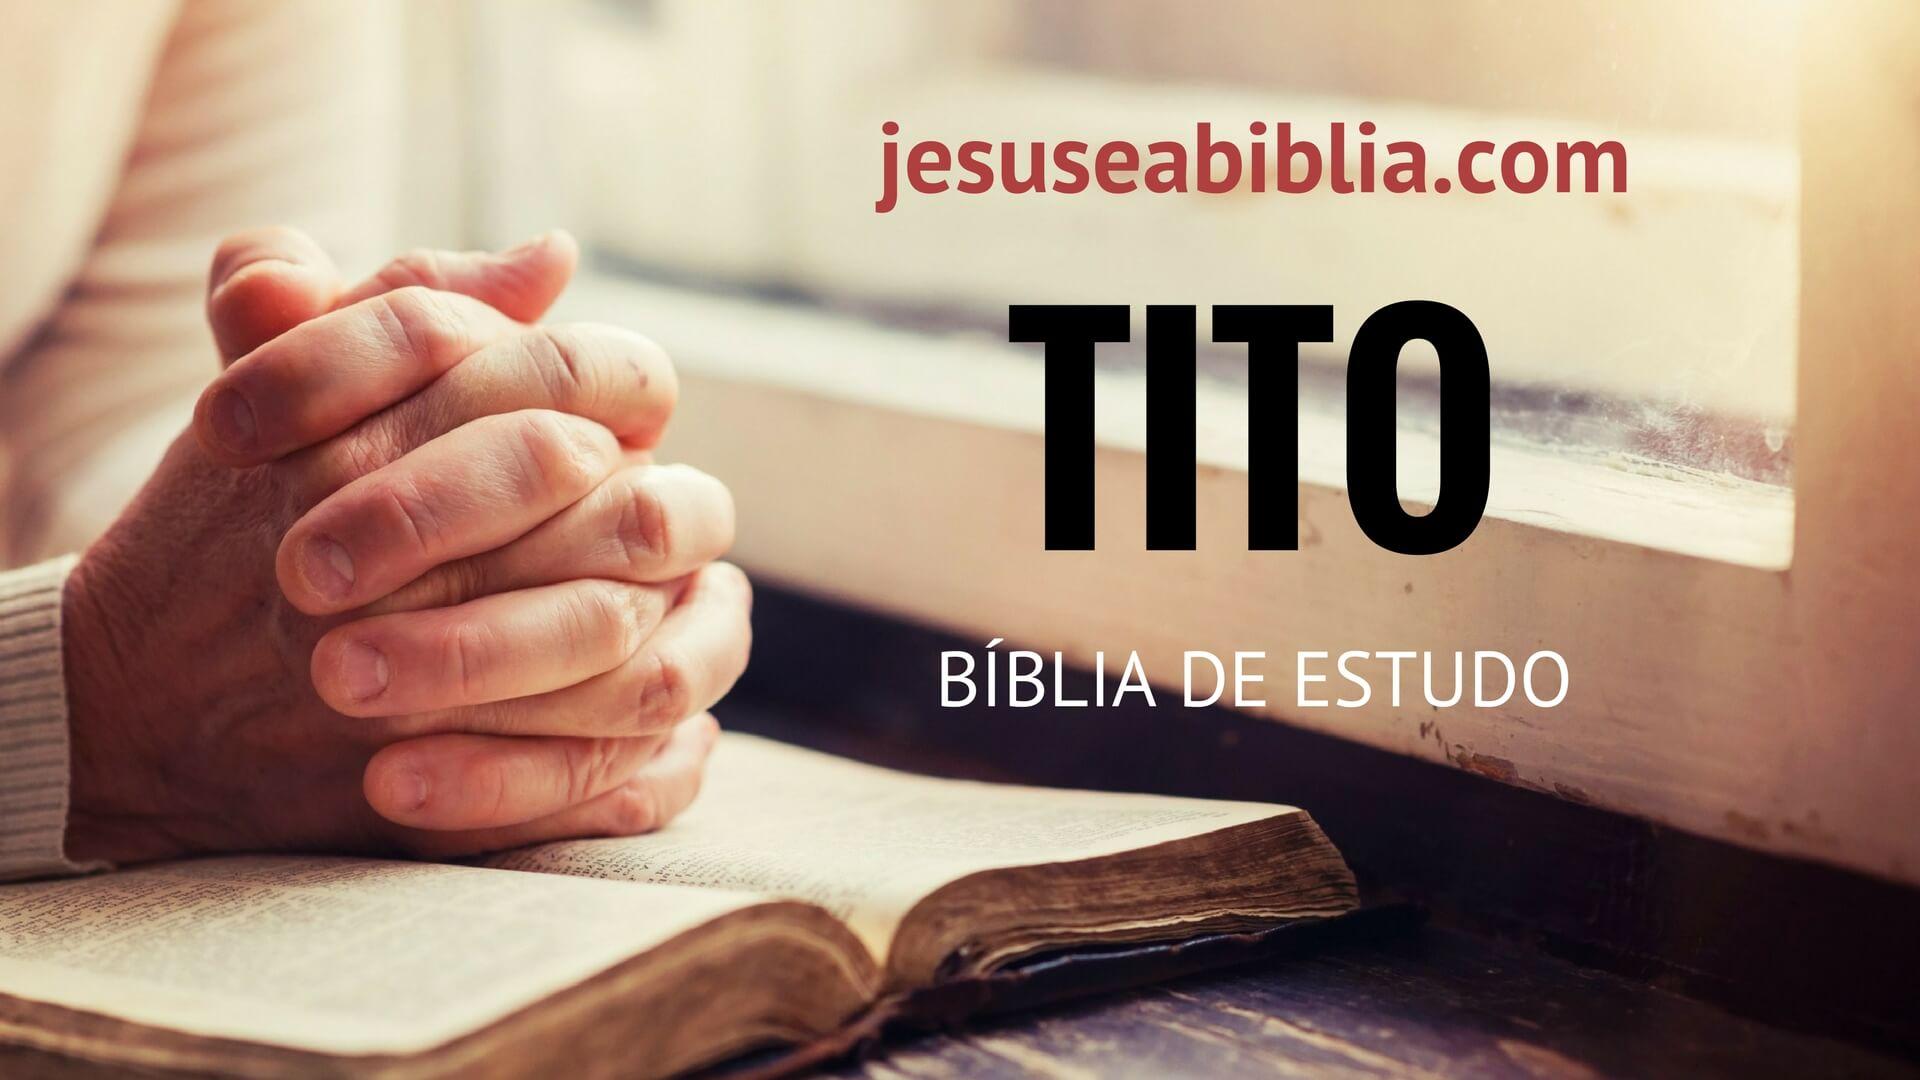 Tito - Bíblia de Estudo Online